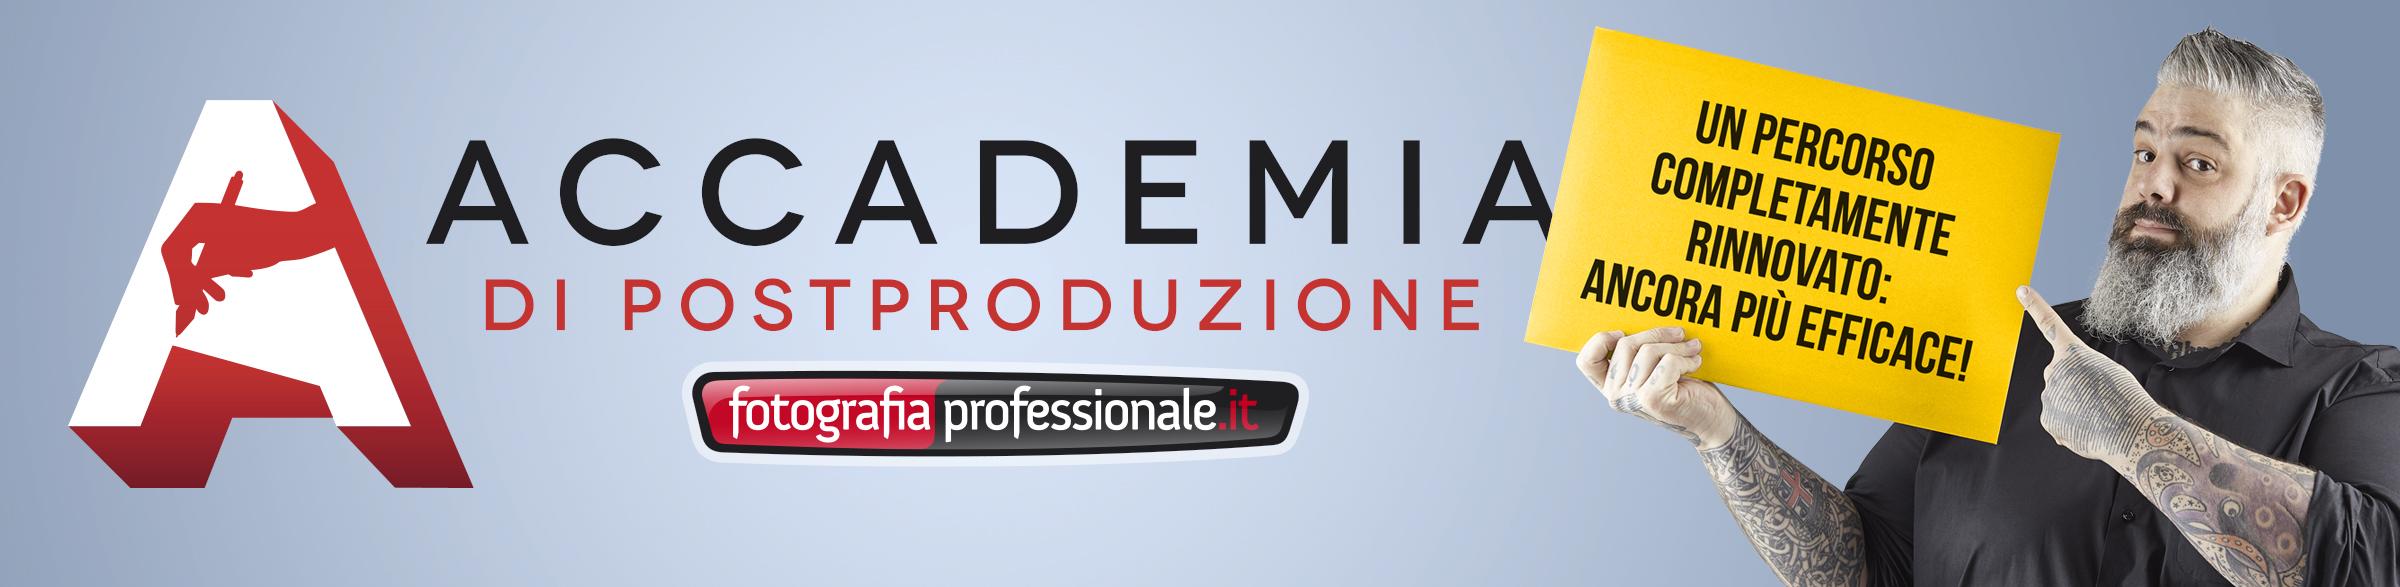 Accademia di PostProduzione di FotografiaProfessionale.it